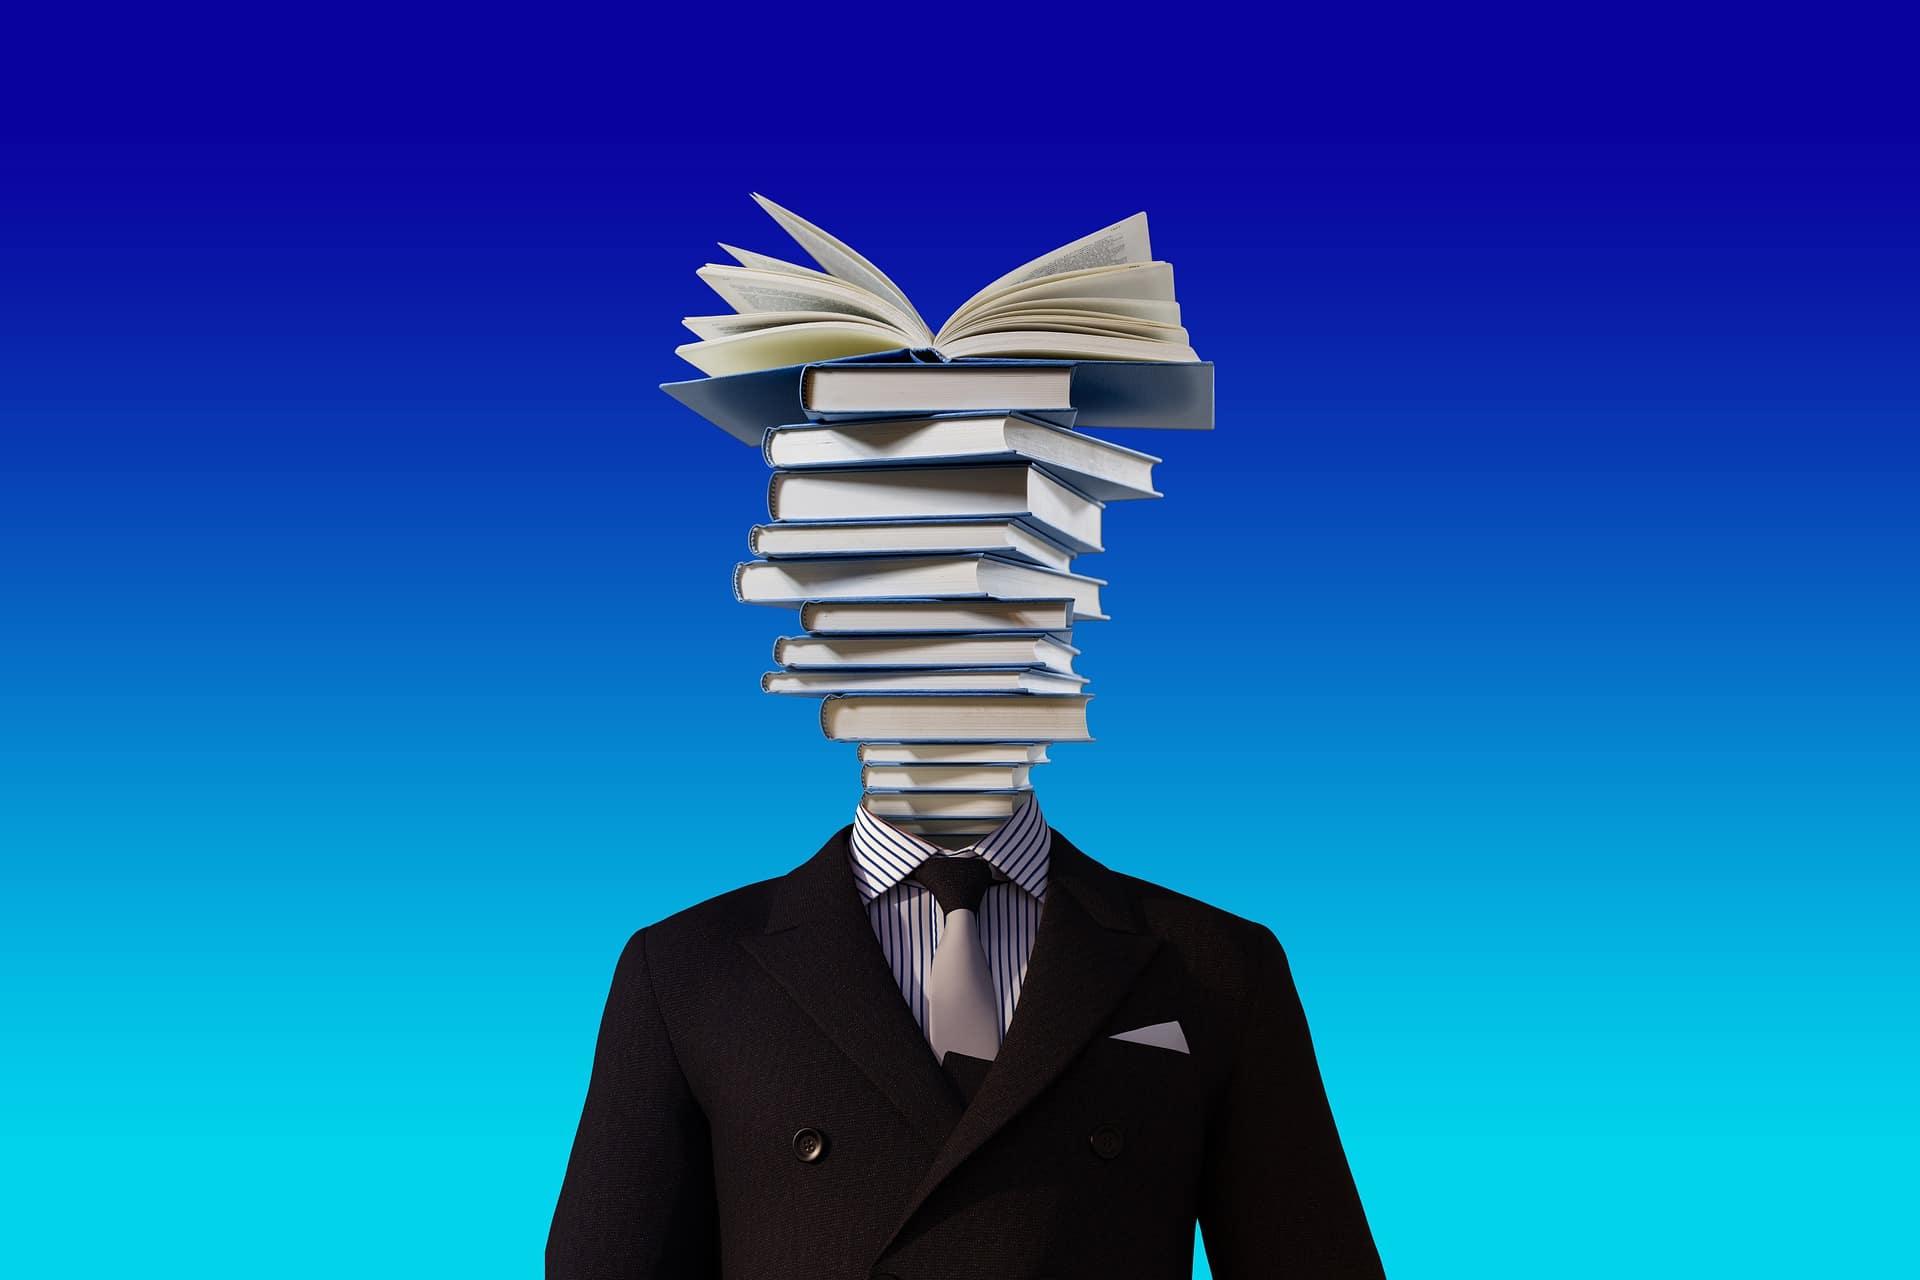 Professor Mind